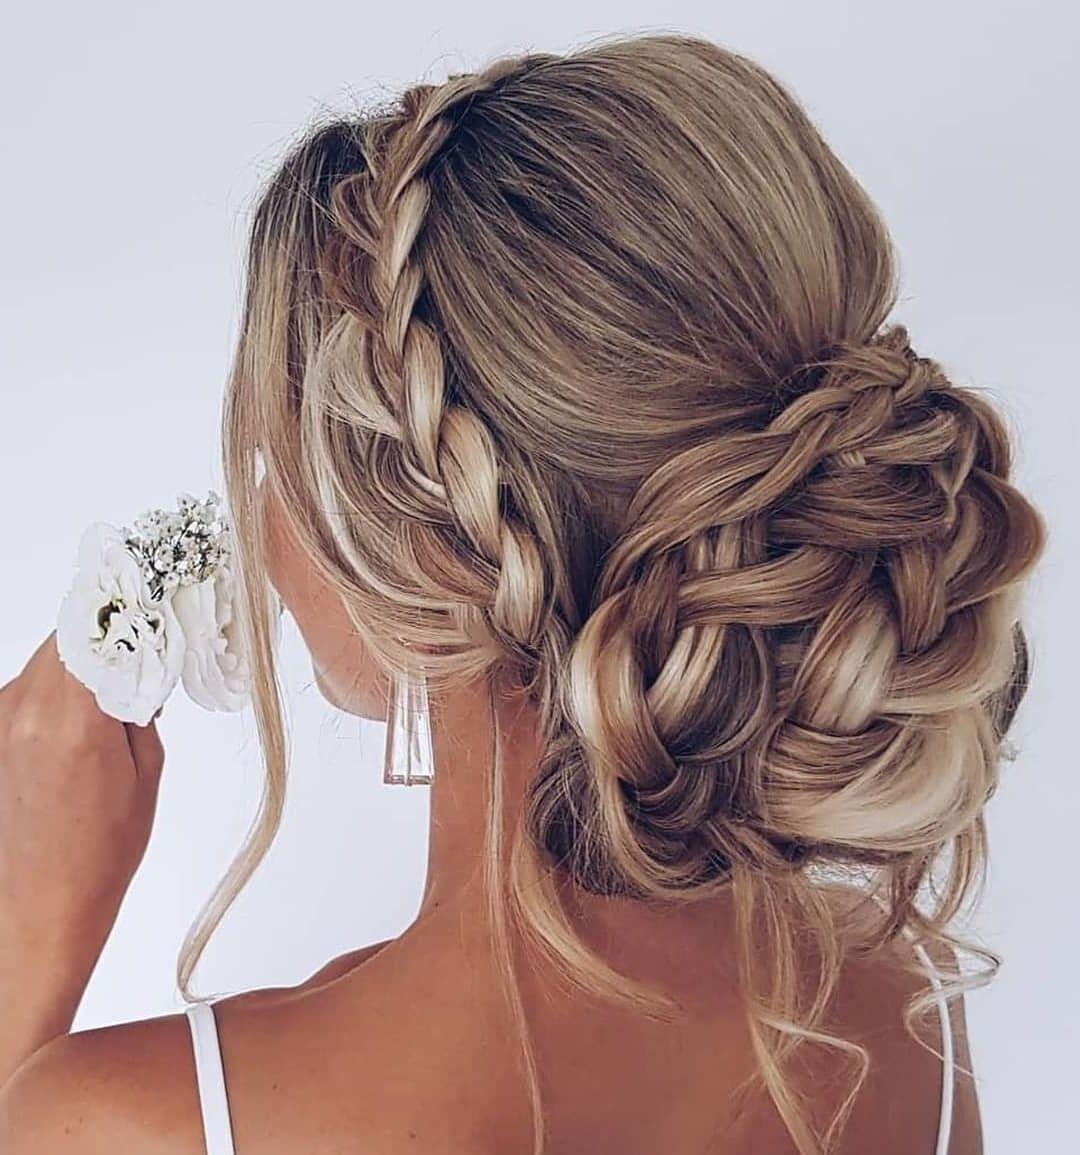 35 Breath-taking Braided Wedding Hairstyles to Shine - Amaze Paperie